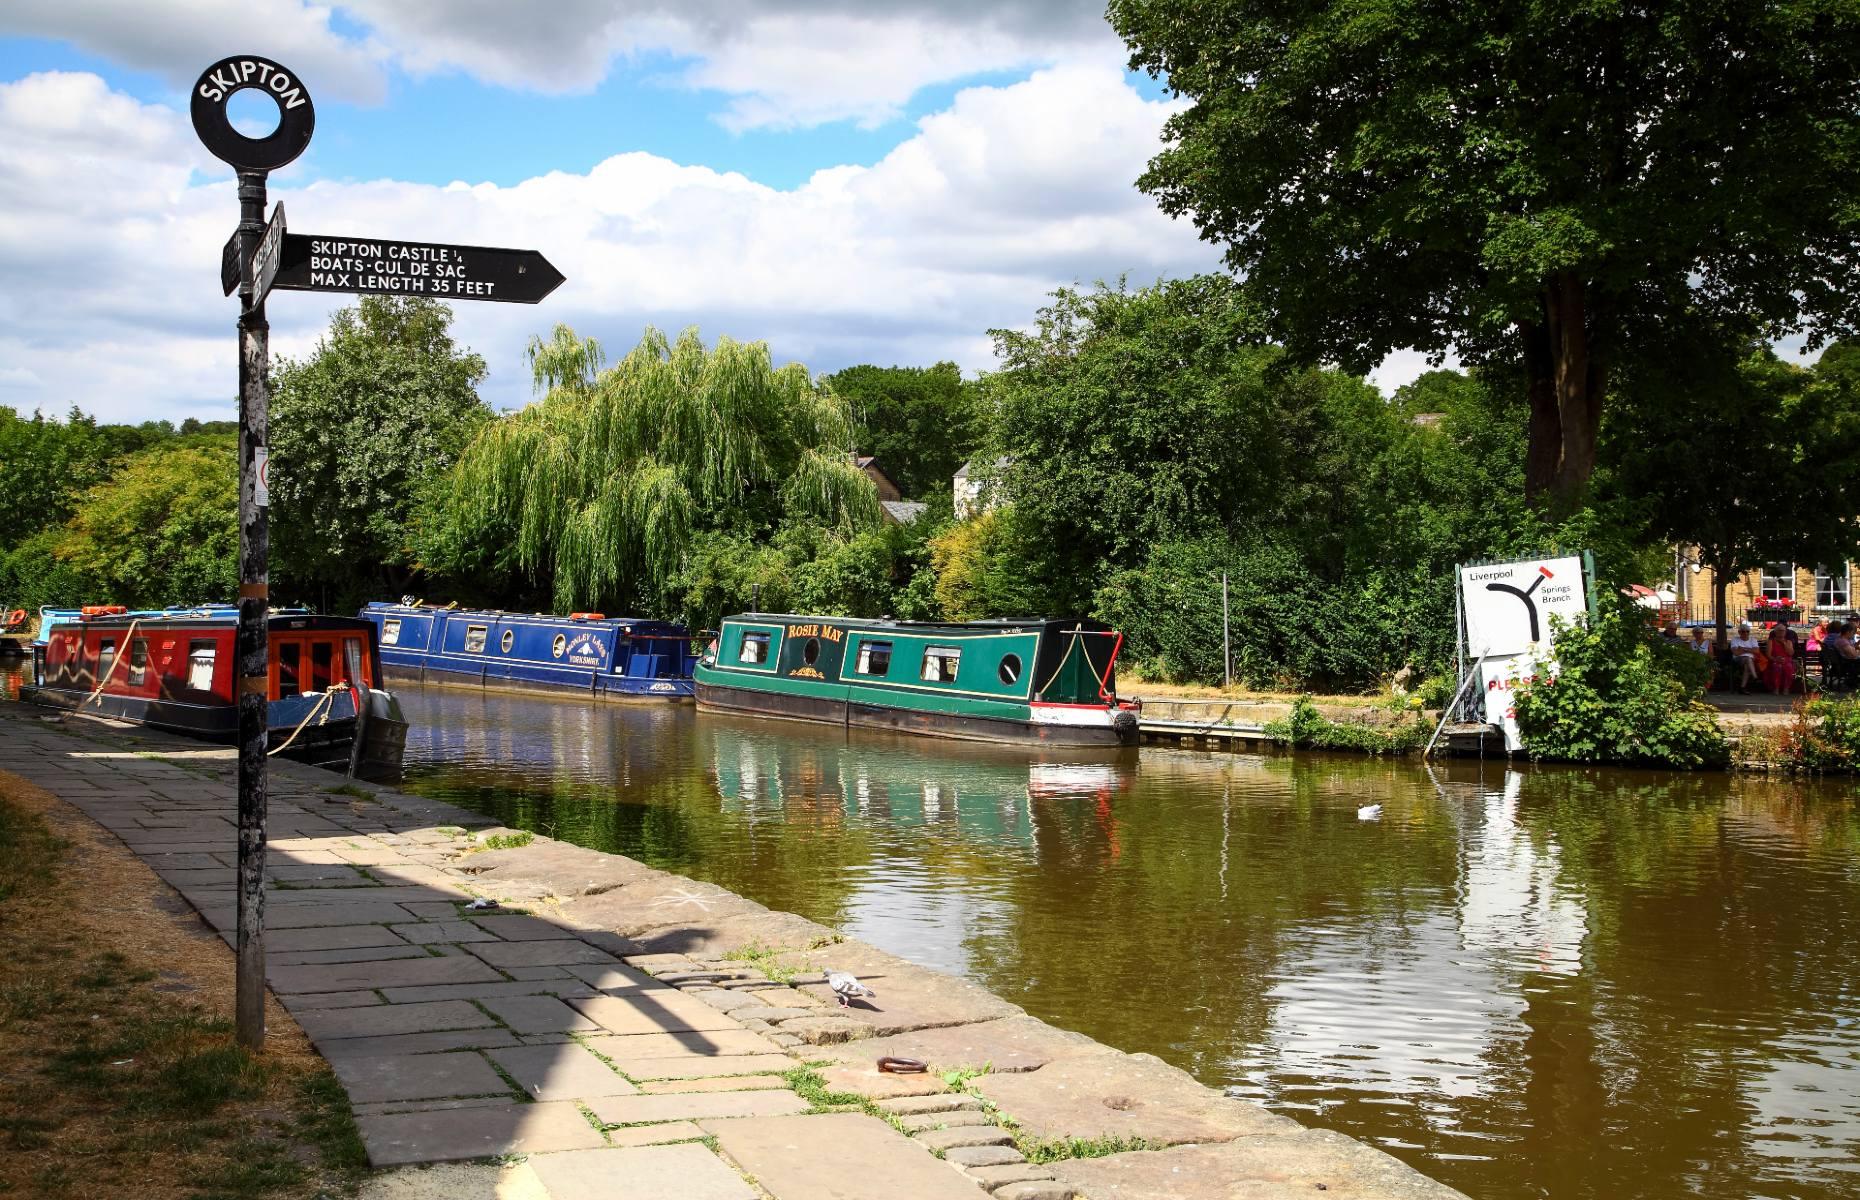 Leeds-Liverpool canal (Image: Andrew E Gardner/Shutterstock)